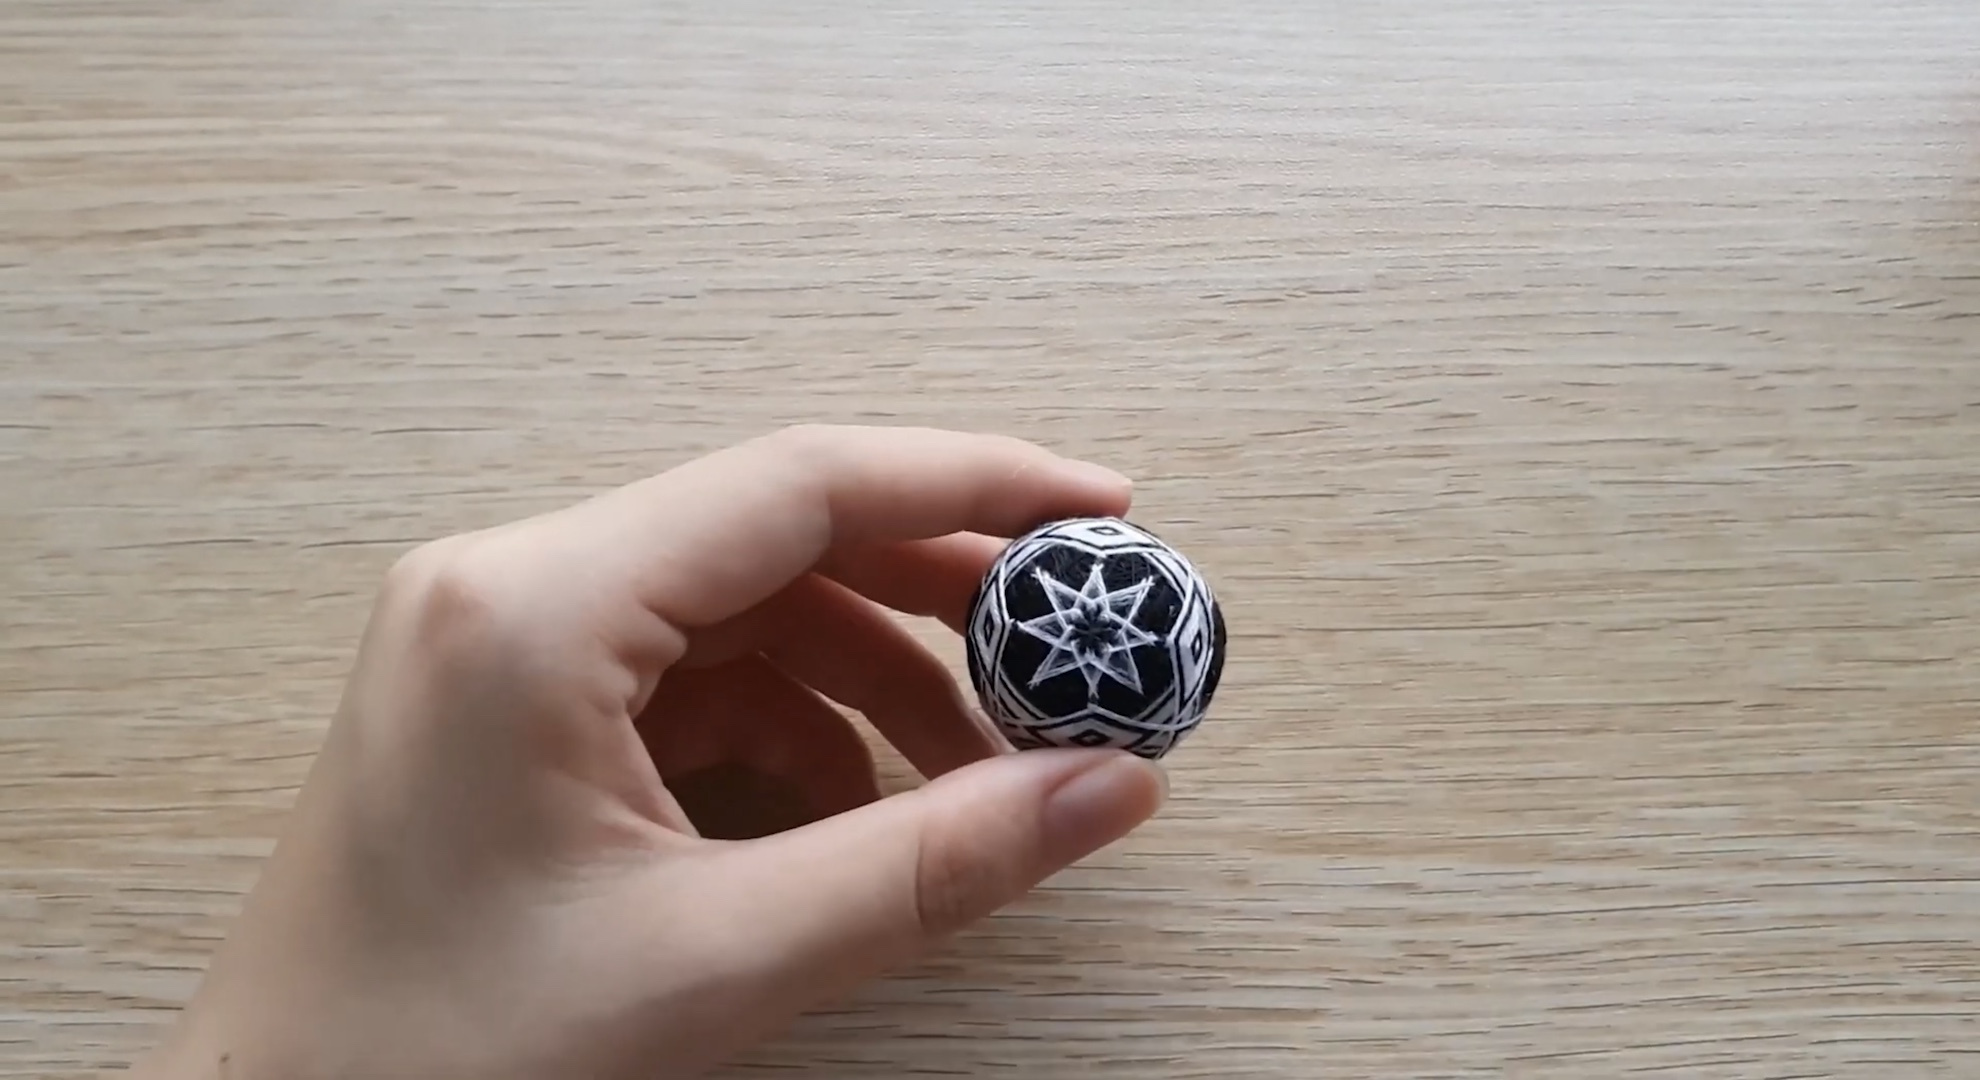 DIY手鞠球编织教程:八分球编织方法(下)